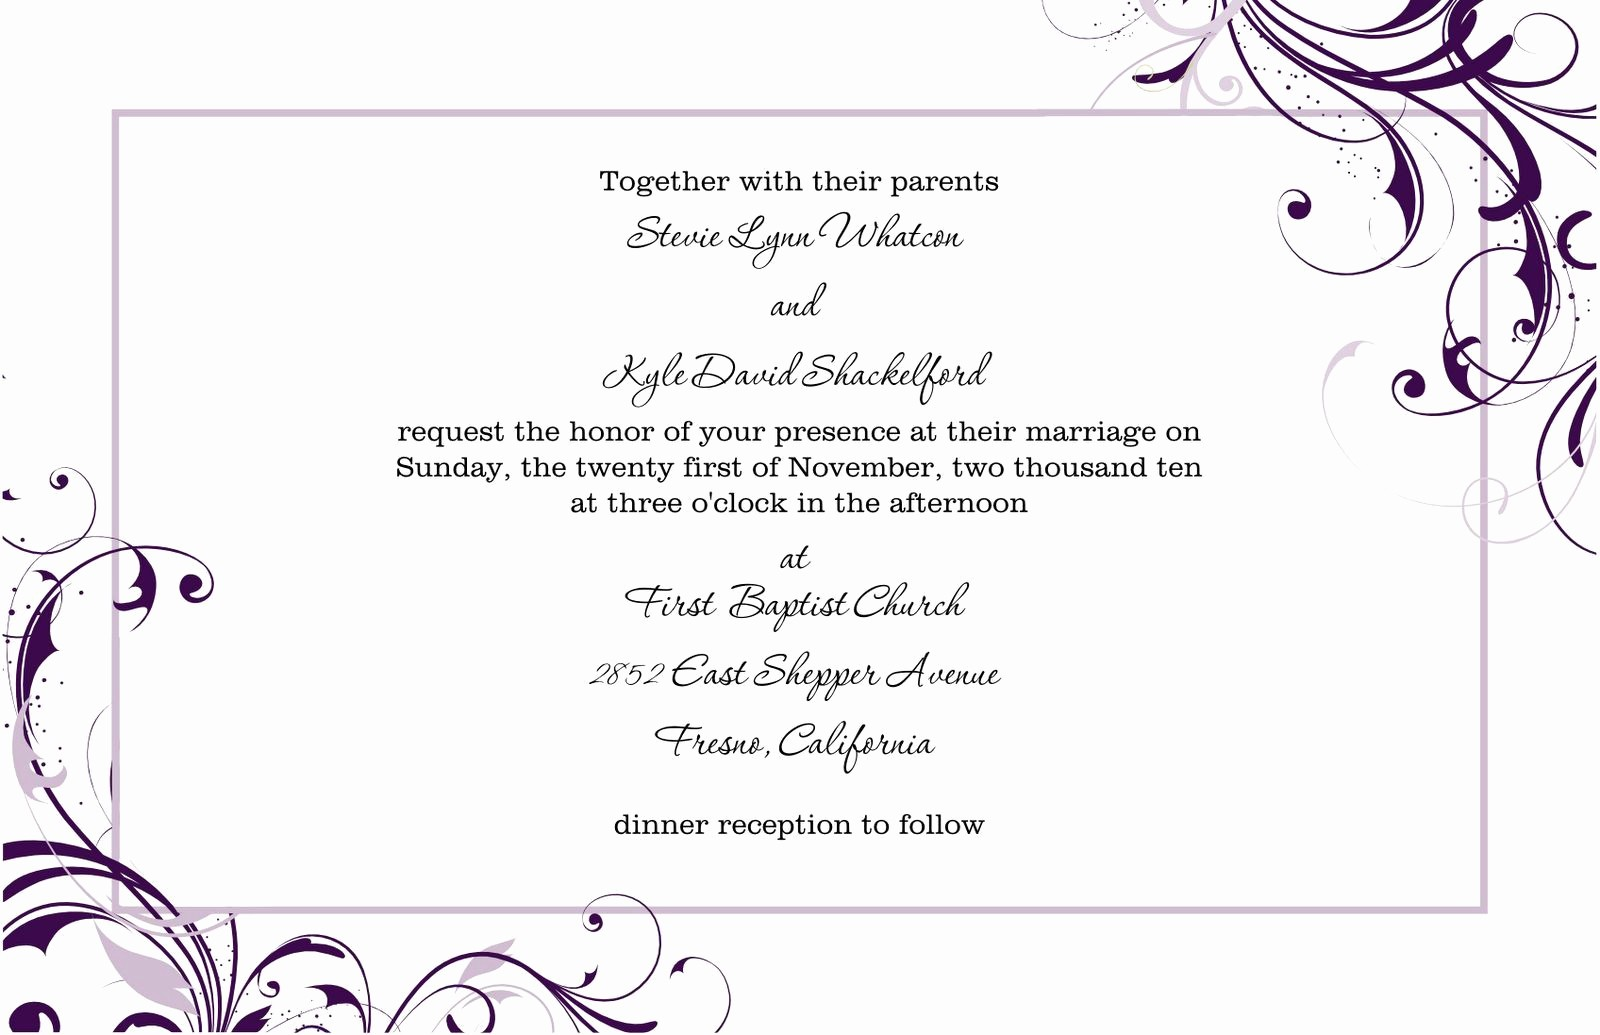 Free Wedding Templates Microsoft Word Unique Free Blank Wedding Invitation Templates for Microsoft Word